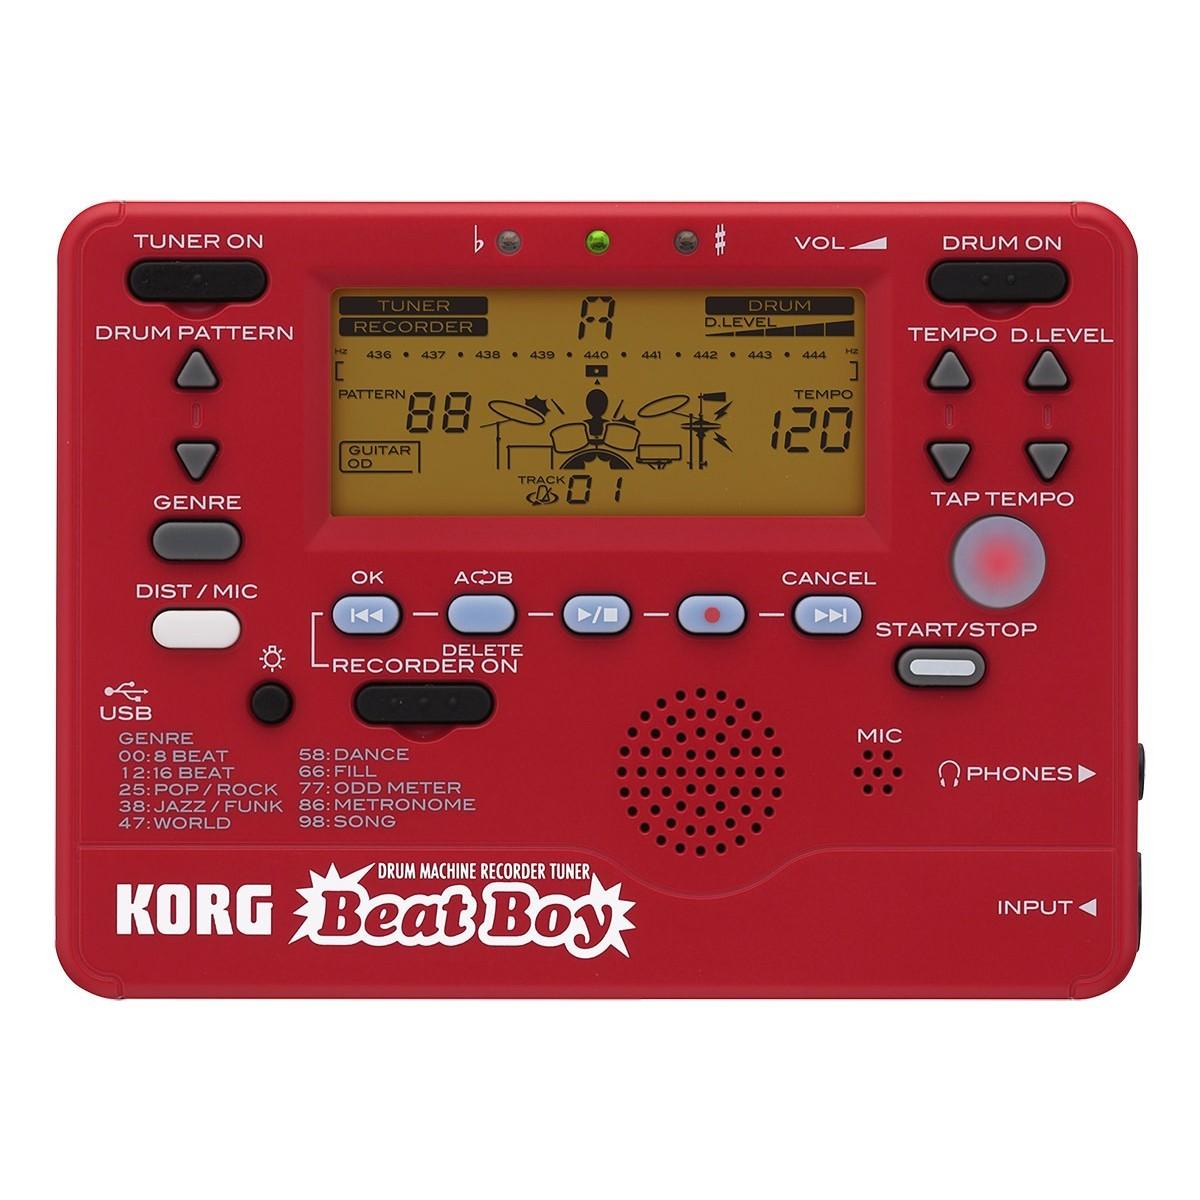 korg beat boy buy drum machine recorder guitar tuner best price. Black Bedroom Furniture Sets. Home Design Ideas